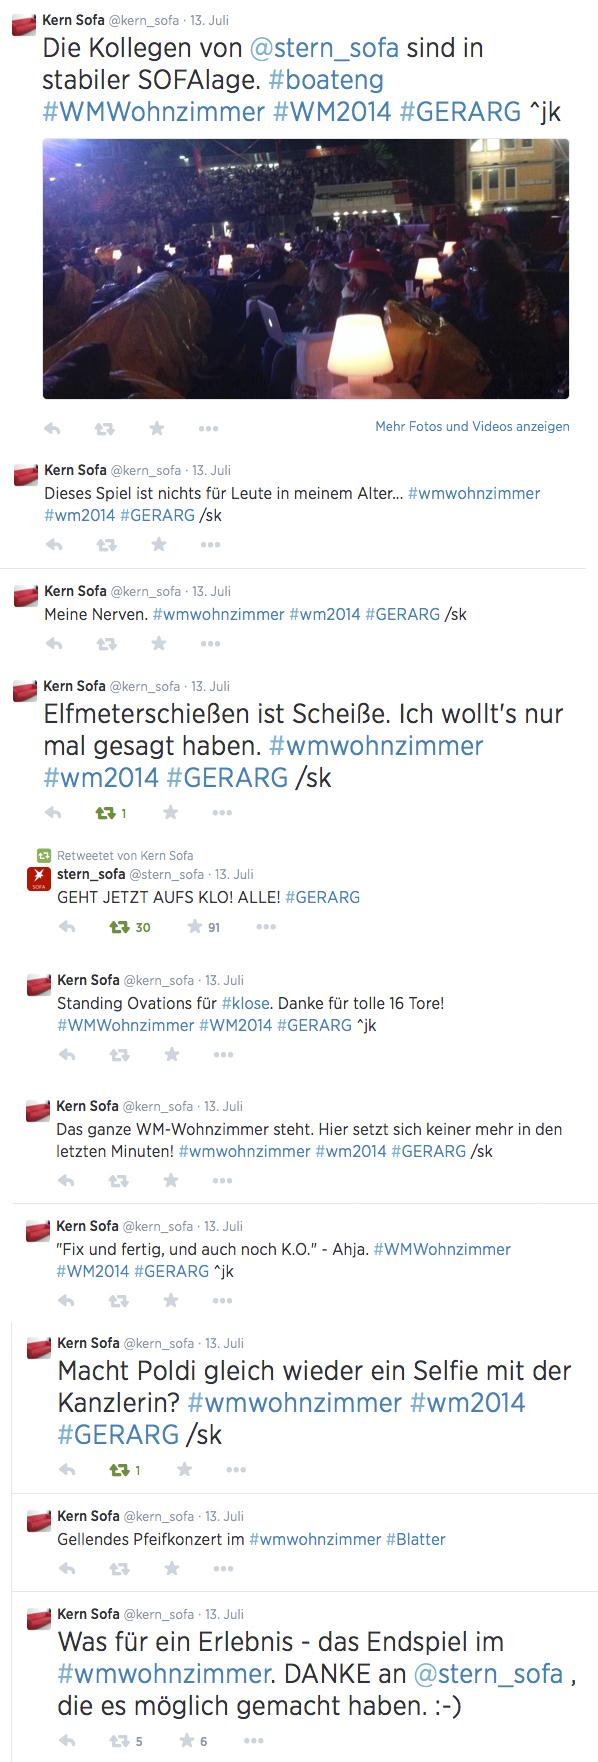 Twitter-Nachlese